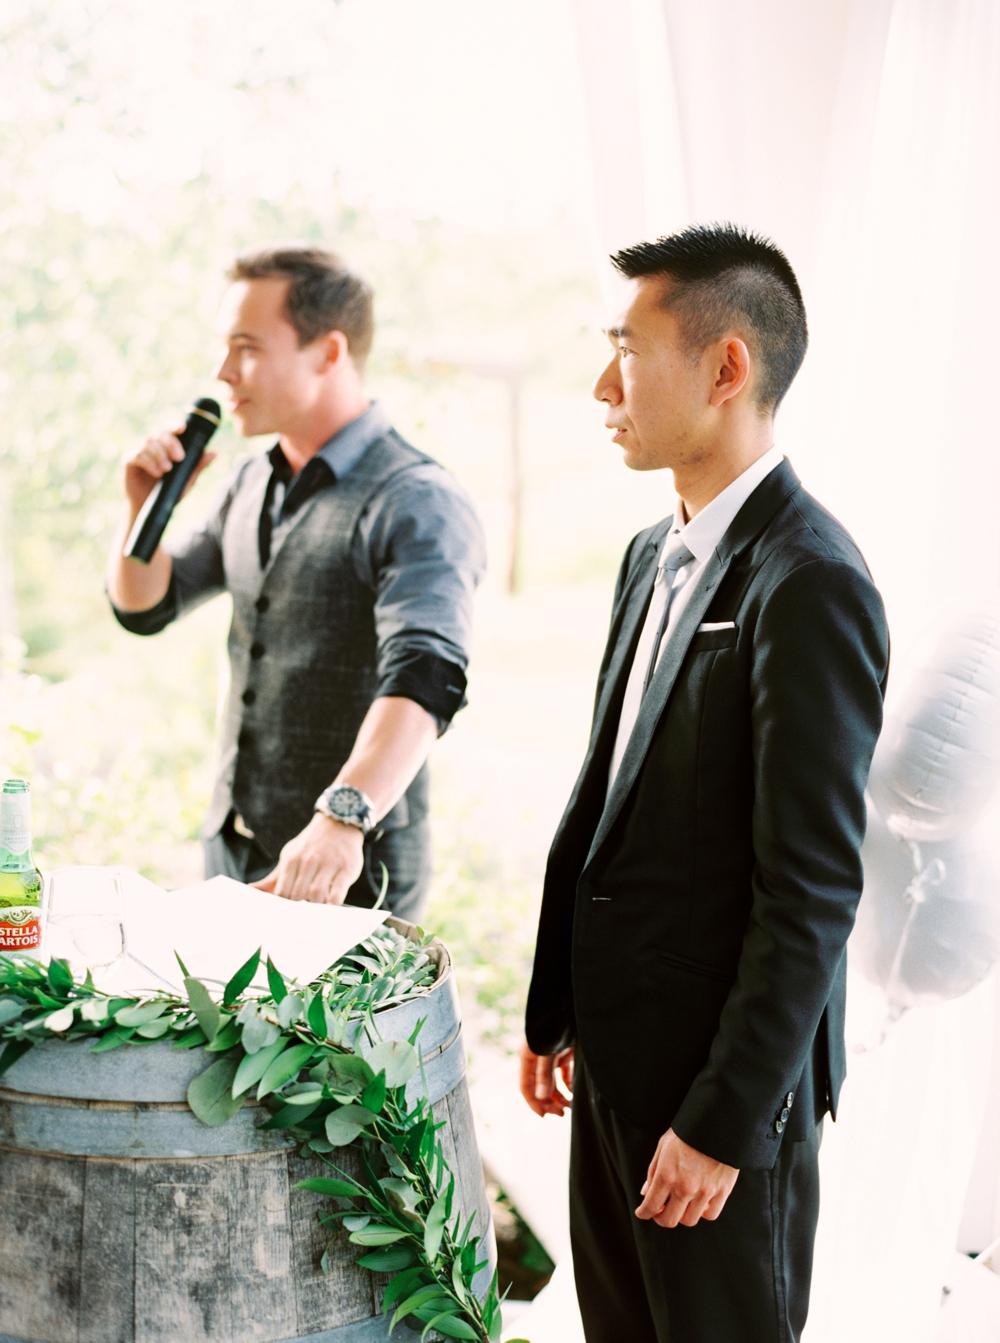 Calgary Wedding Photographer | Meadow Muse Pavilion Wedding | Canmore Photographers | Fish Creek Park Tent Wedding